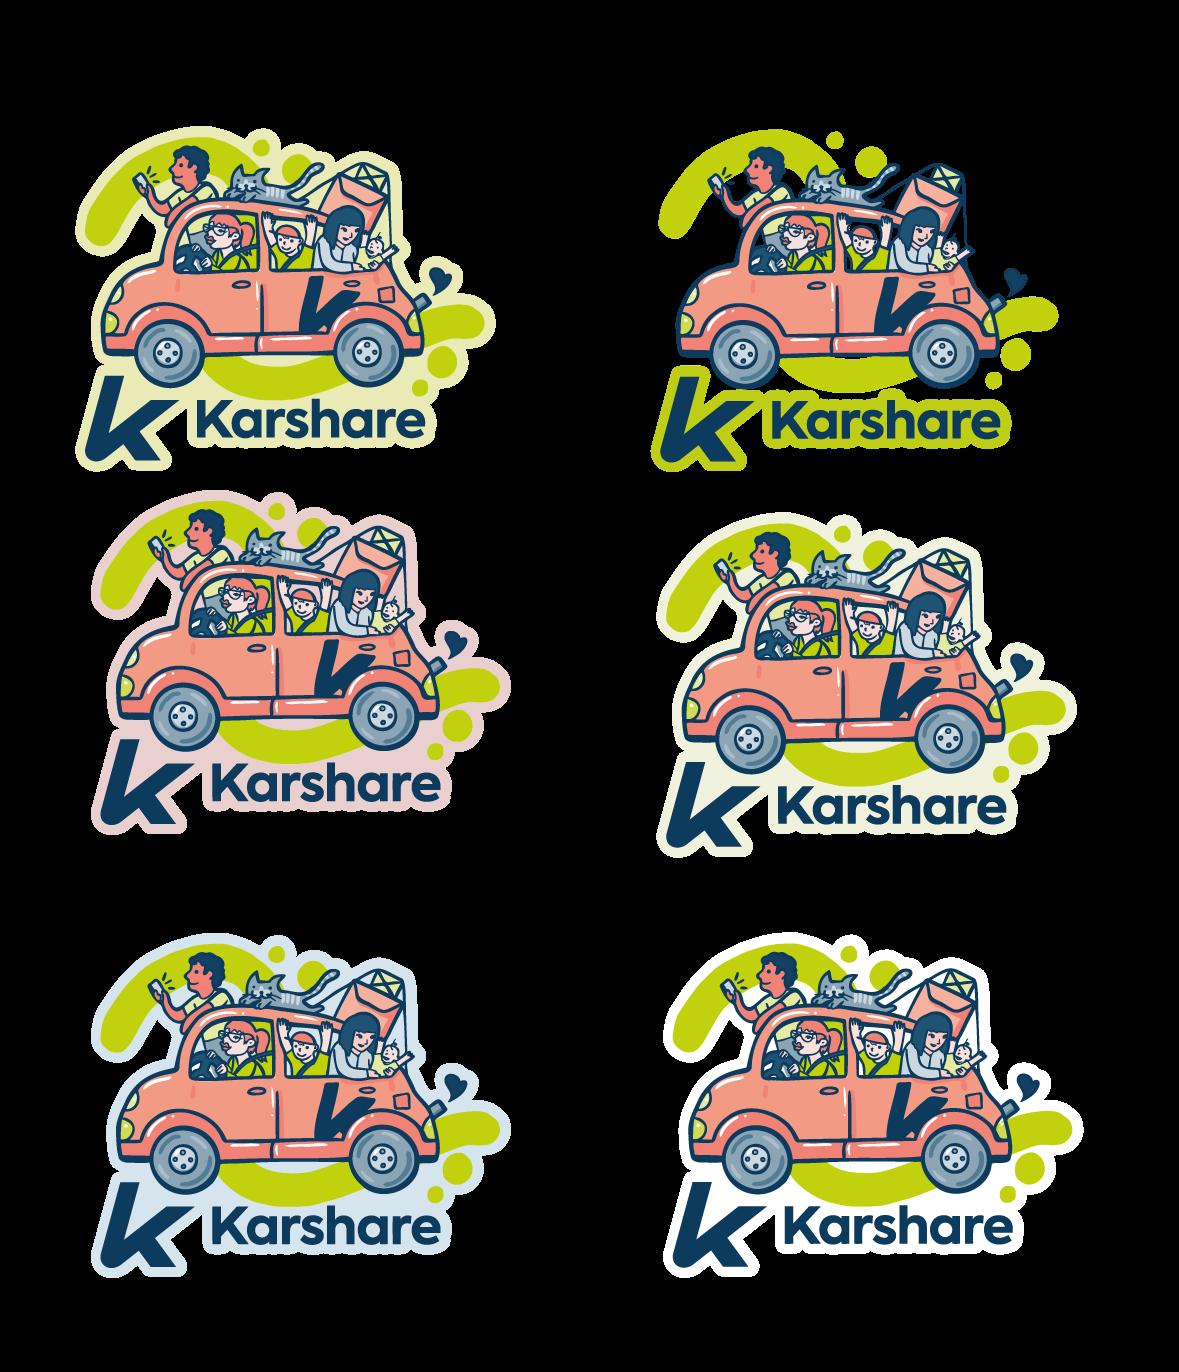 karshare-vector-with-dye-cut